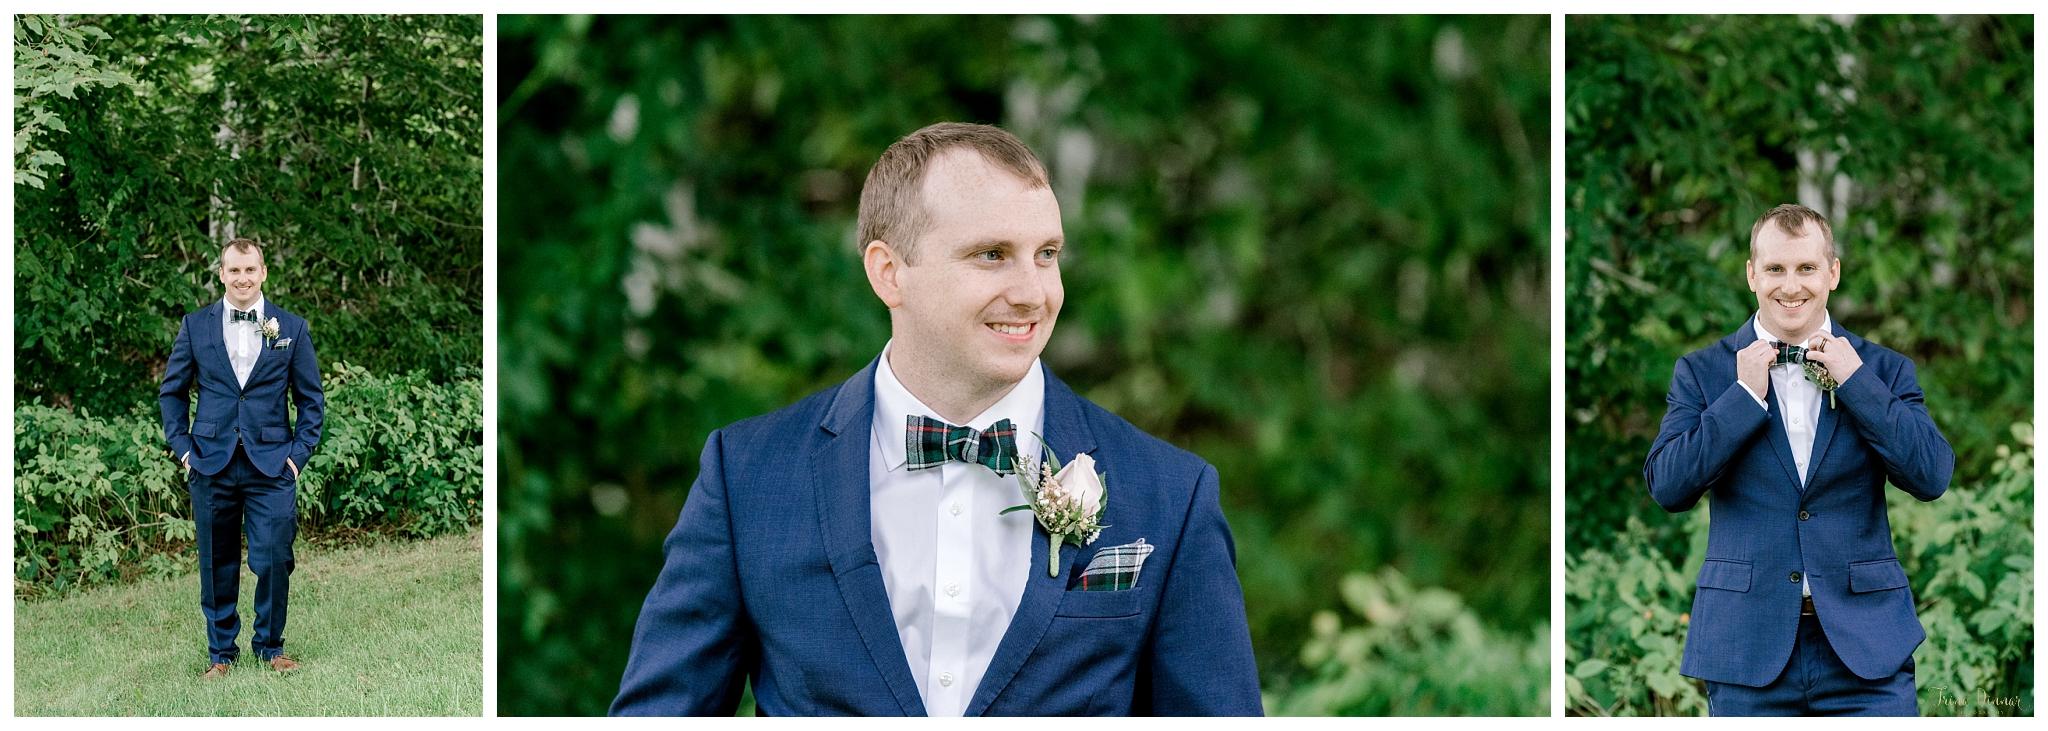 Dan's Groom Wedding Day Portraits